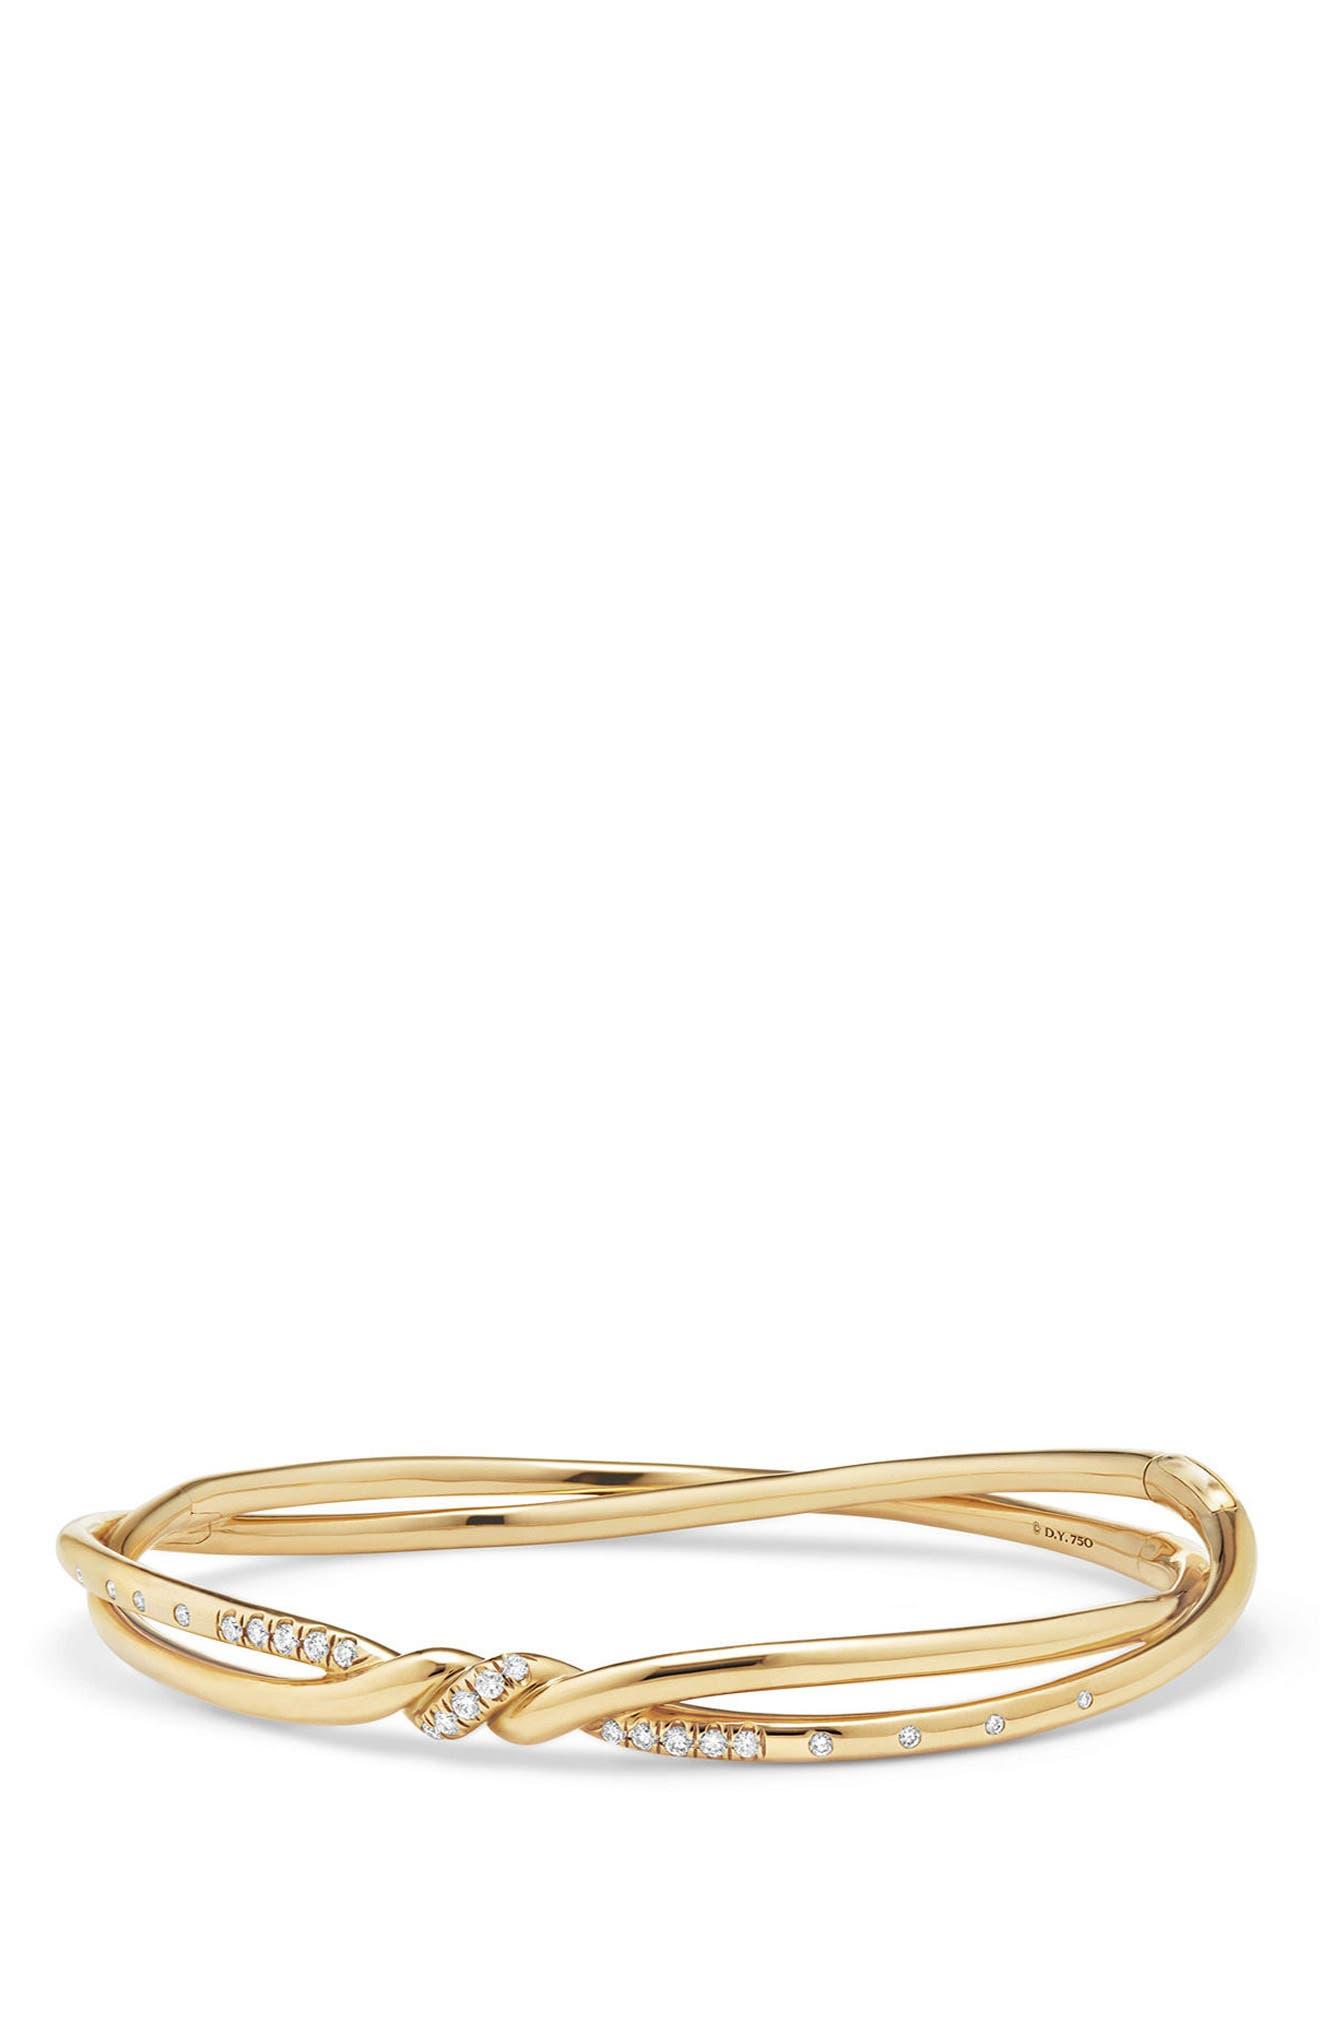 Continuance Center Twist 18K Gold Bracelet with Diamonds,                             Main thumbnail 1, color,                             YELLOW GOLD